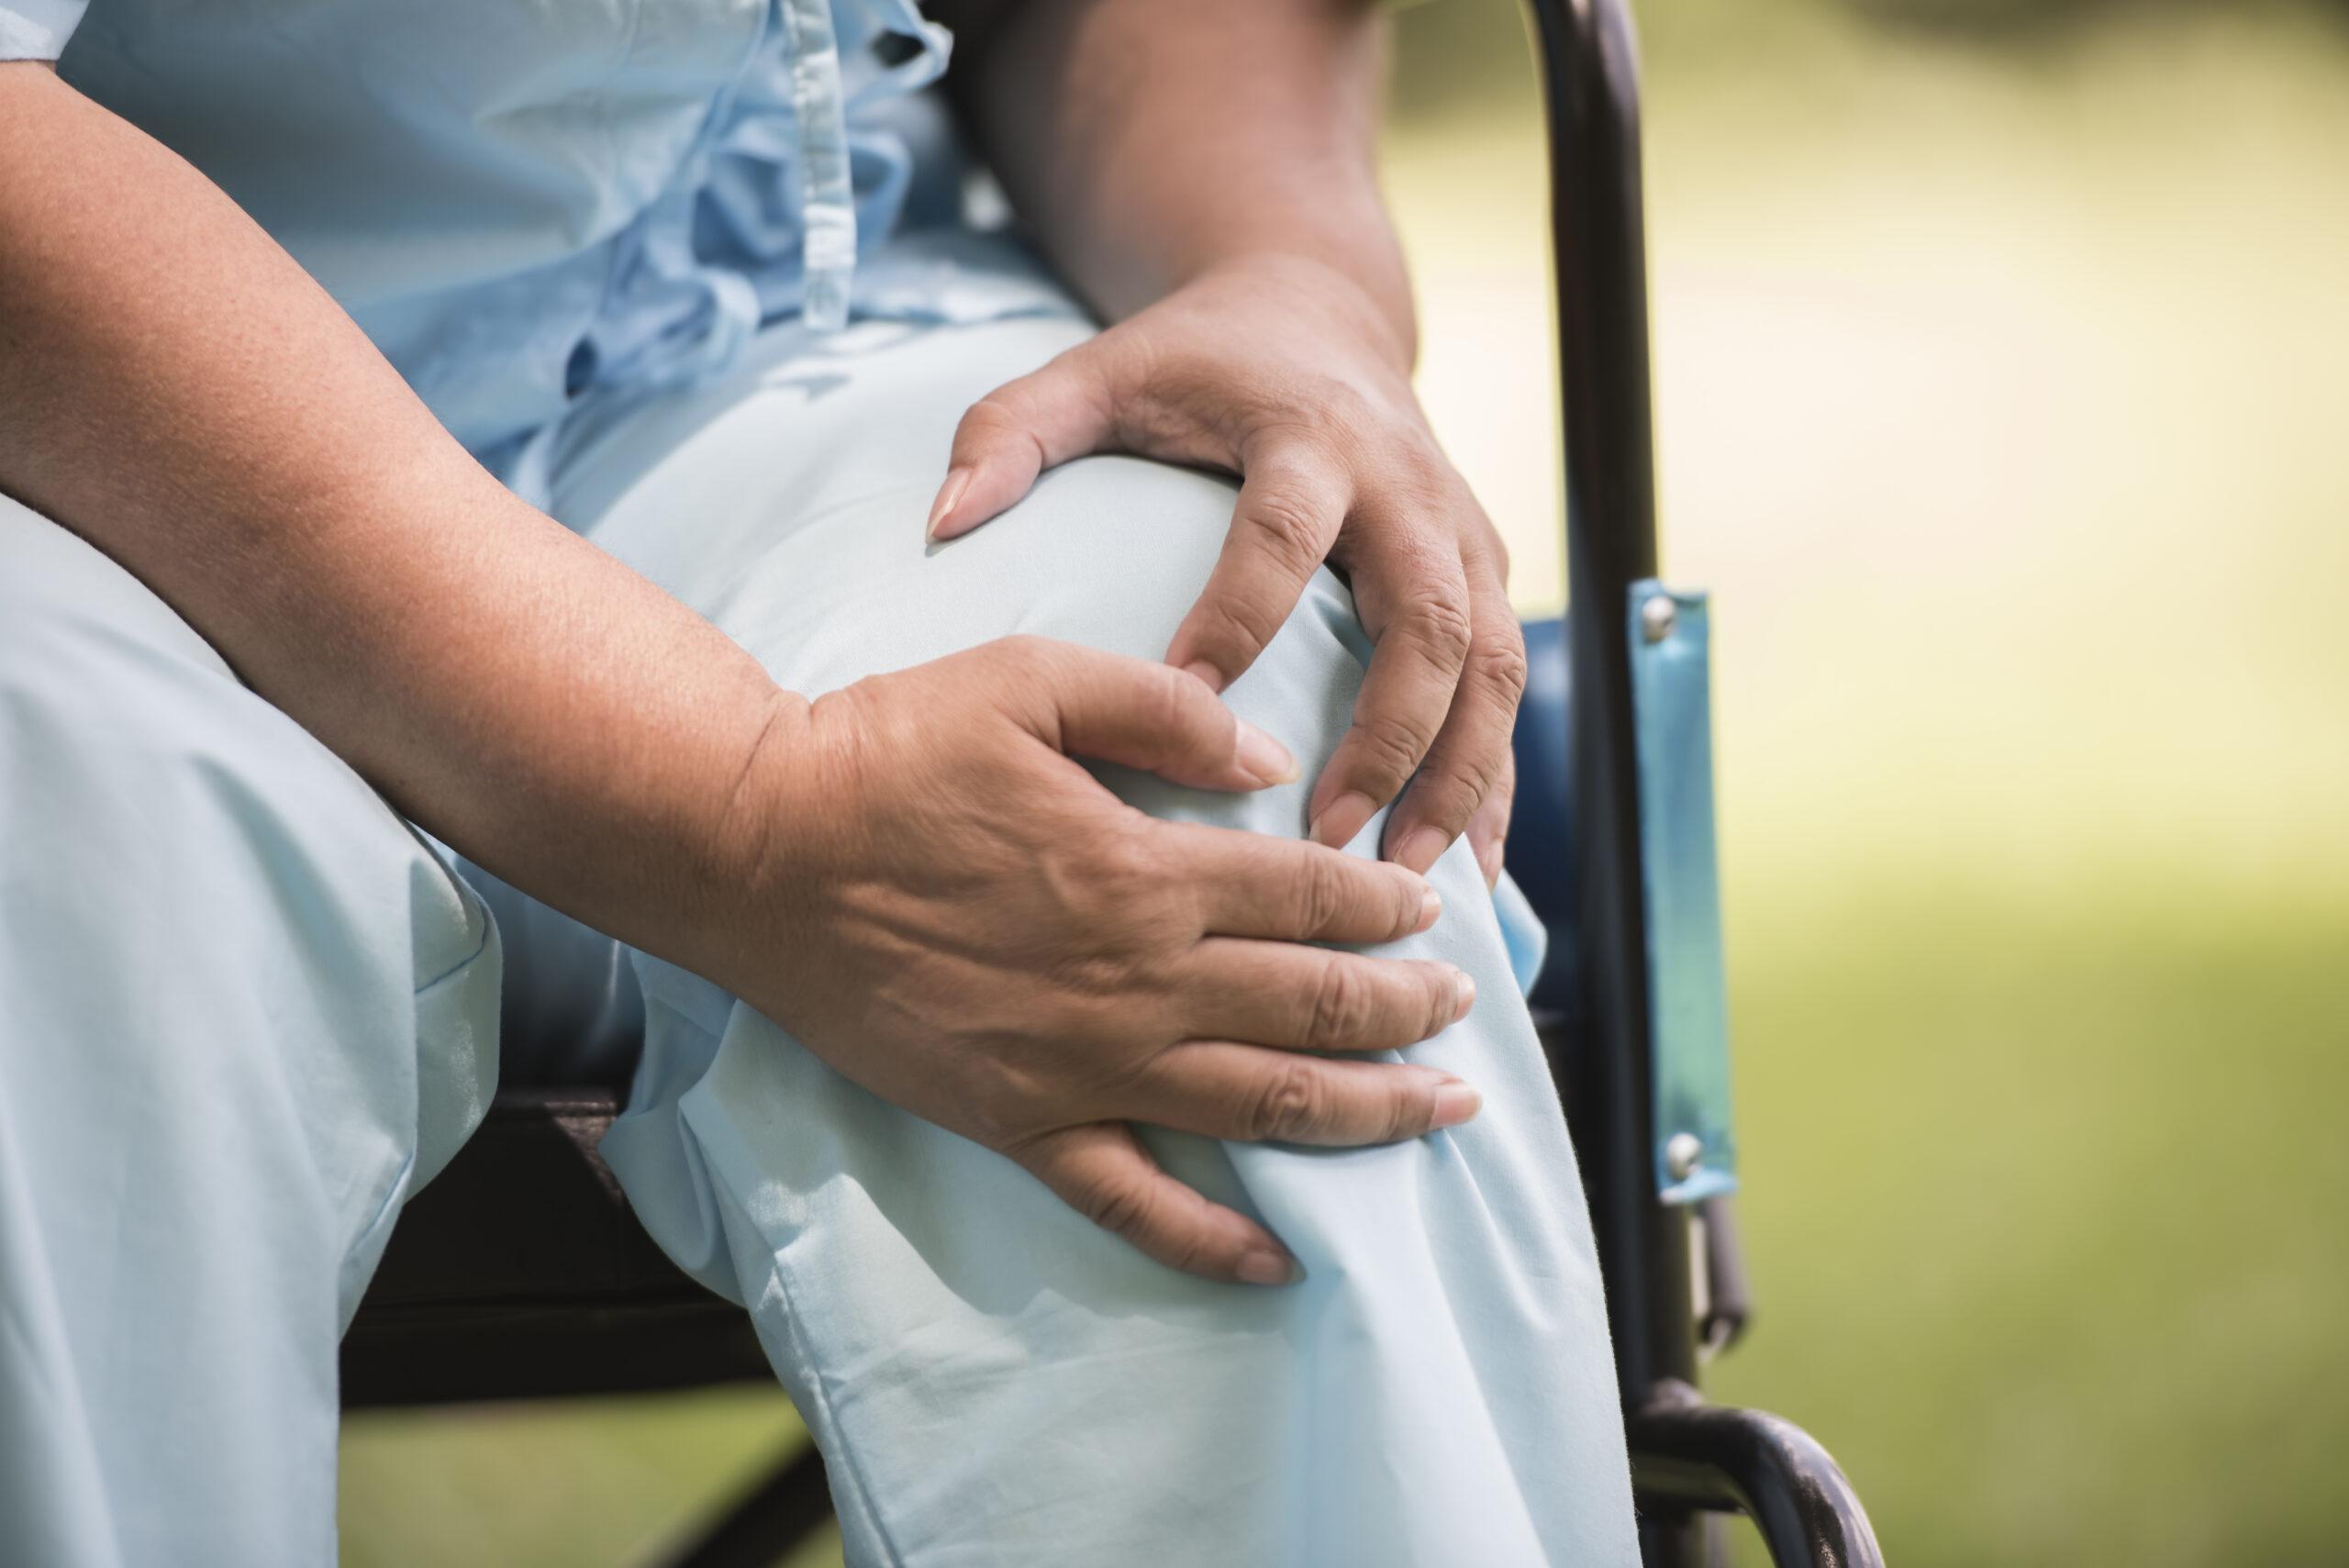 Artróza kolene